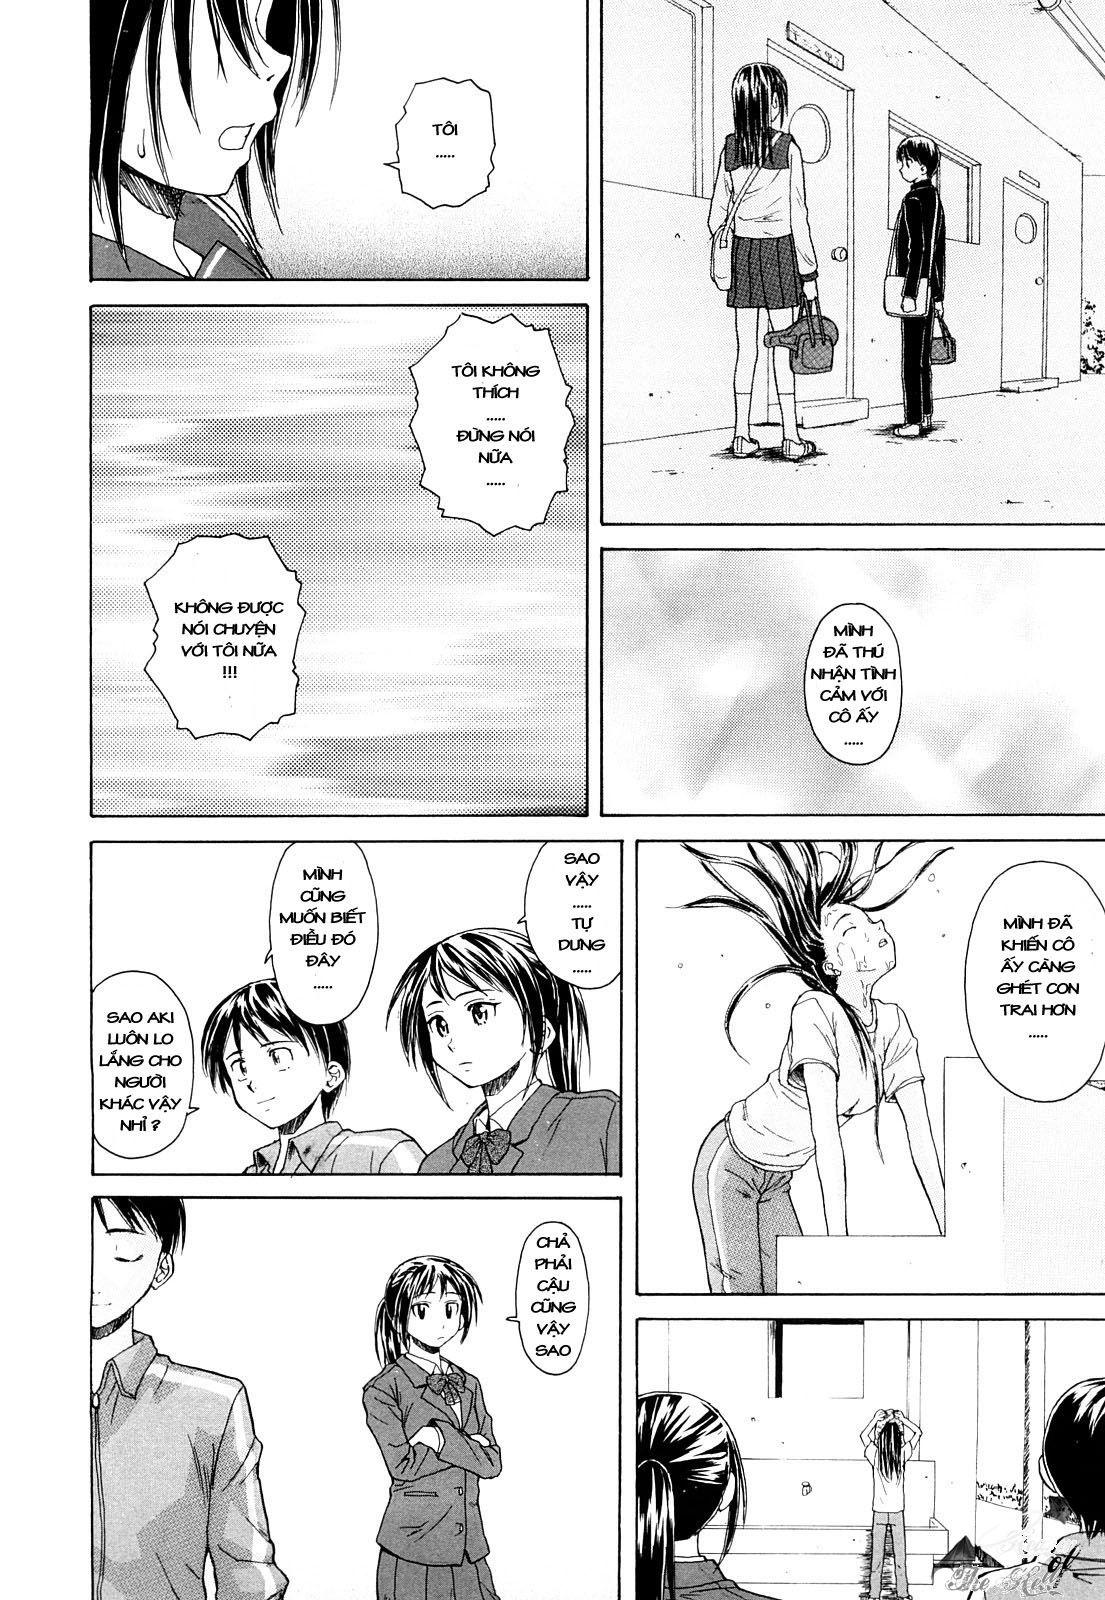 TruyenHay.Com - Ảnh 26 - Setsunai Omoi Chapter 1